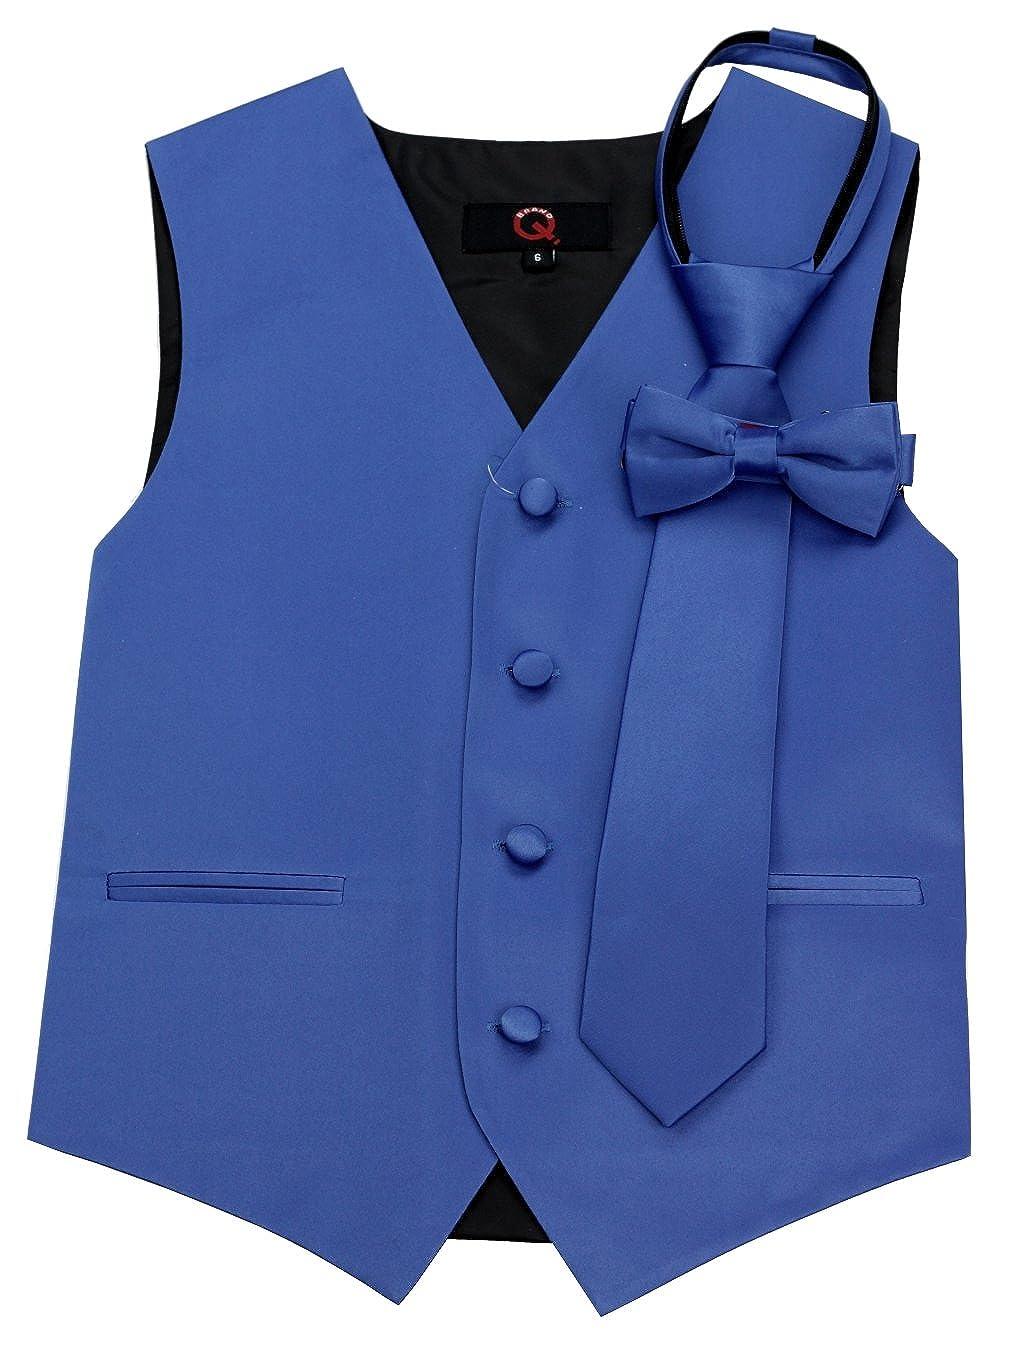 Brand Q Boy's Tuxedo Vest, Zipper Tie & Bow-Tie Set in Royal Blue Brand Q Boy's Tuxedo Vest B10i